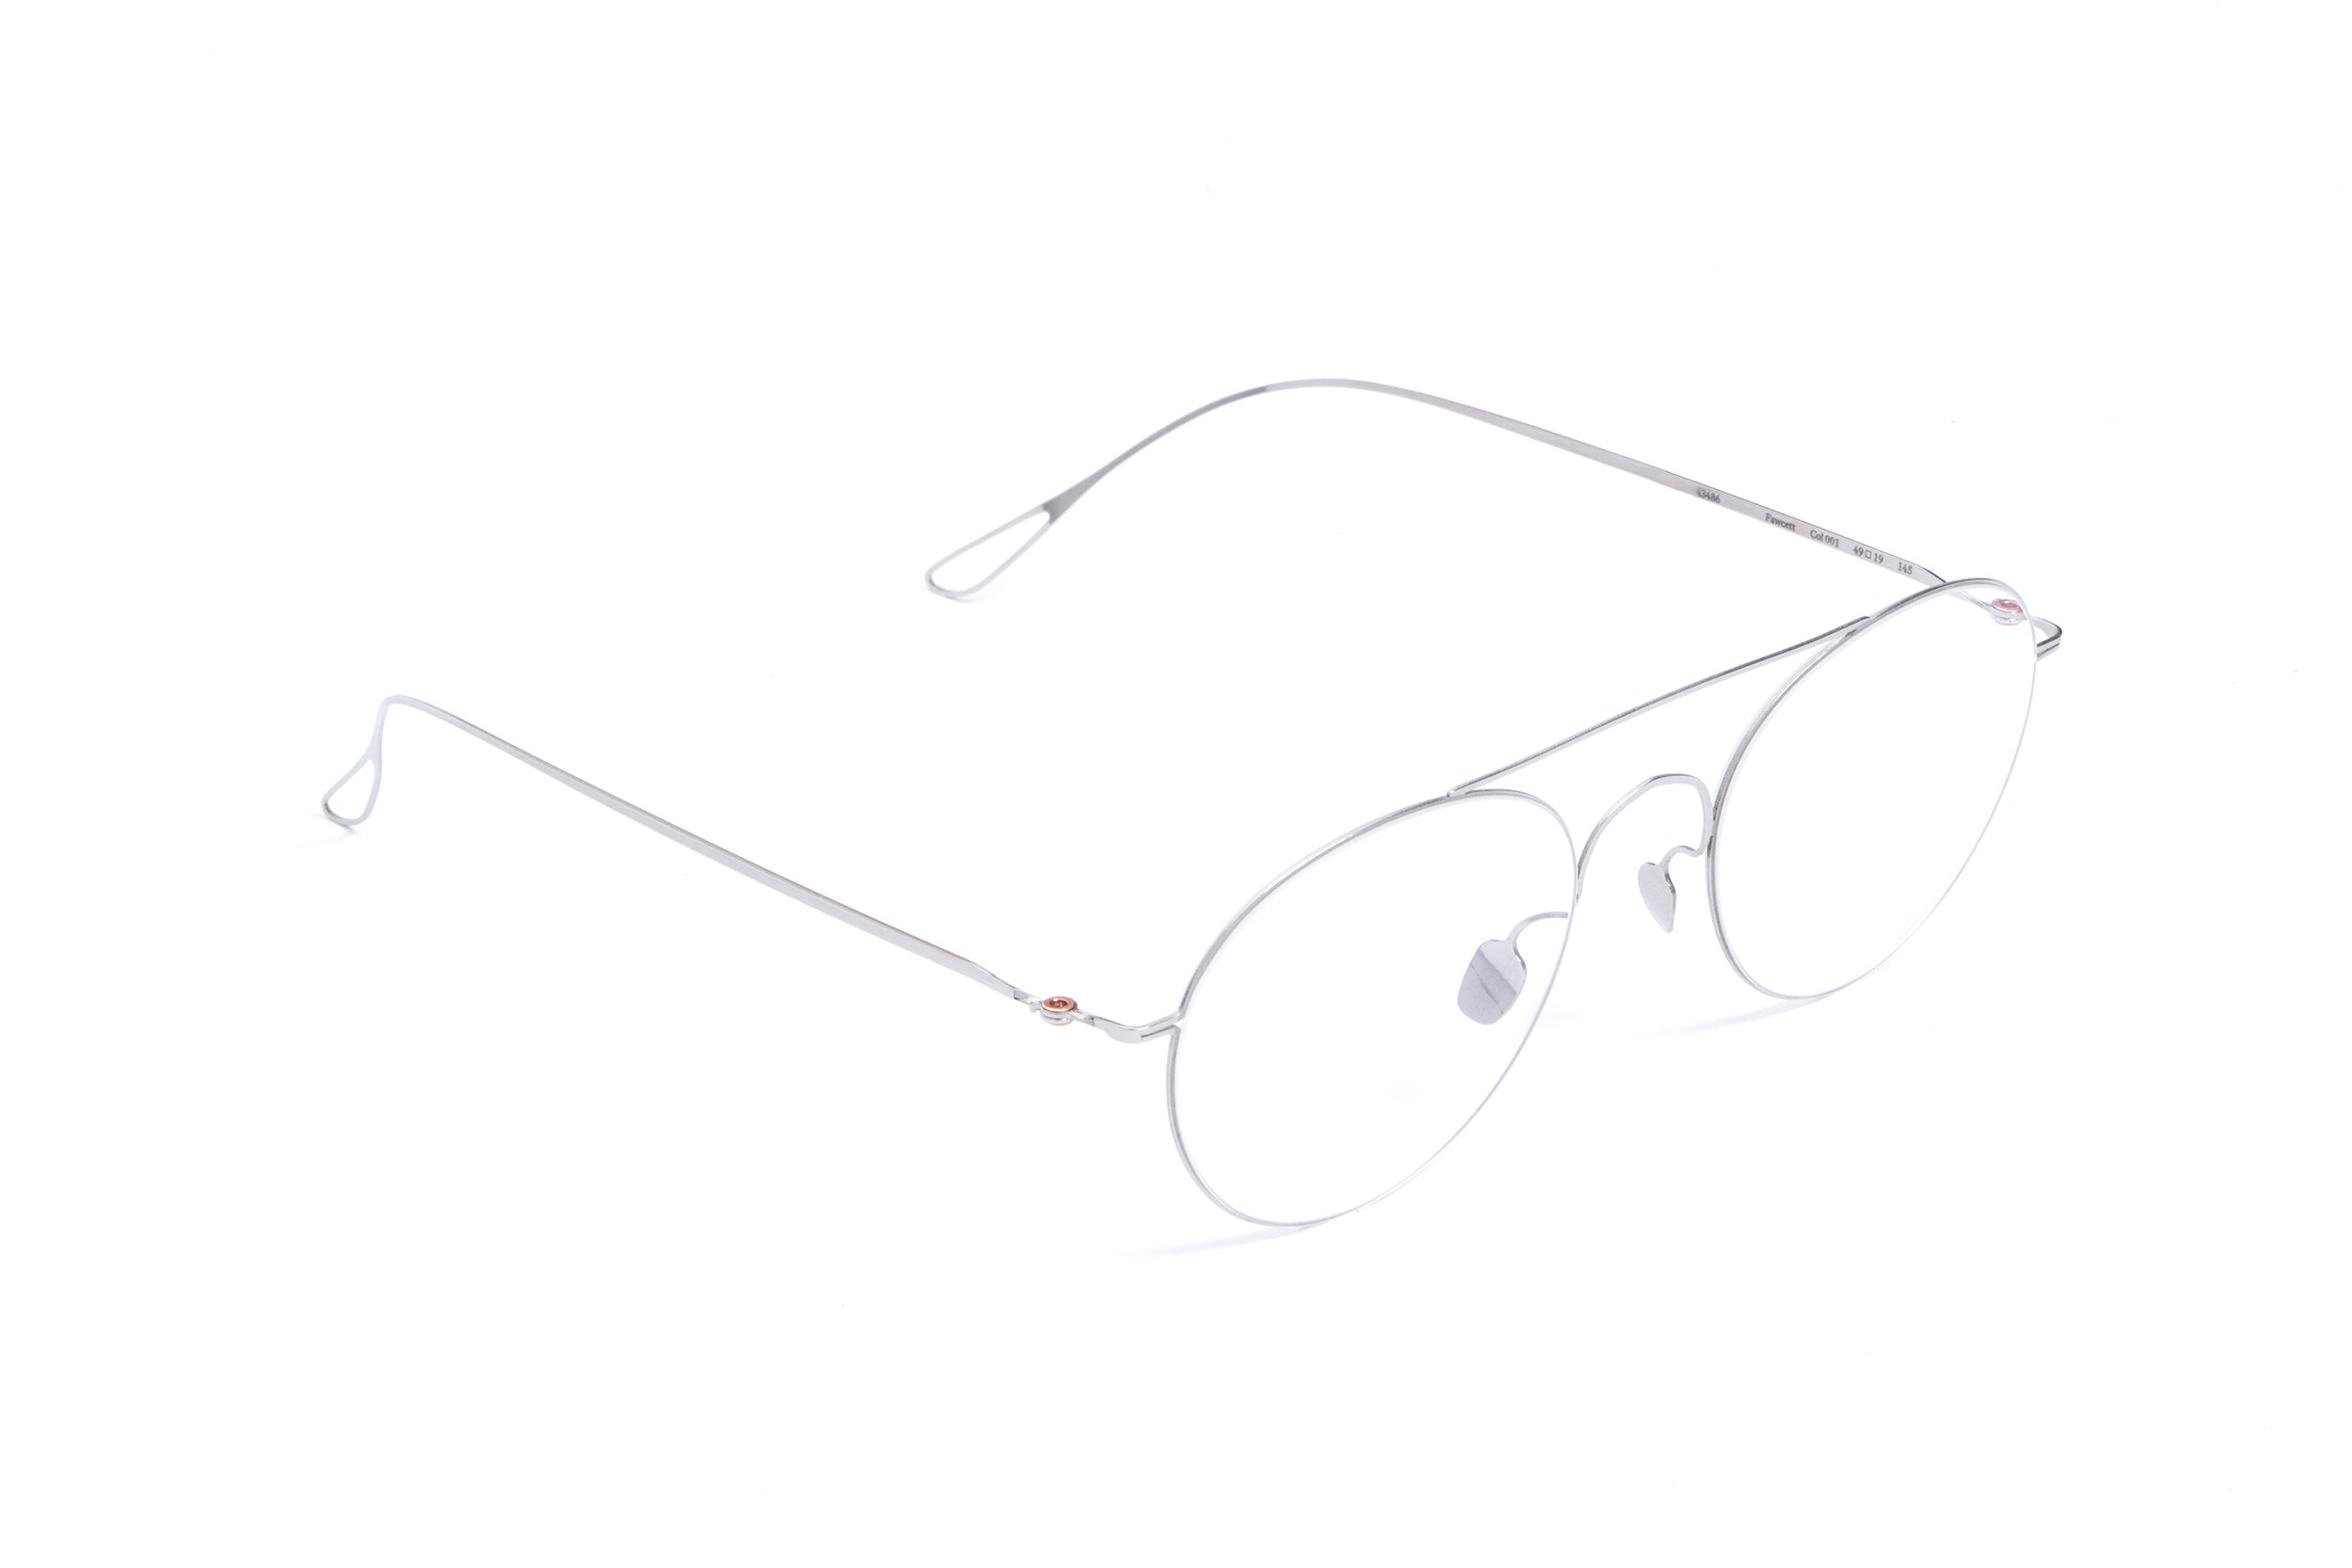 haffmans_neumeister_fawcett_silver_clear_ultralight_eyeglasses_angle_102458.jpg